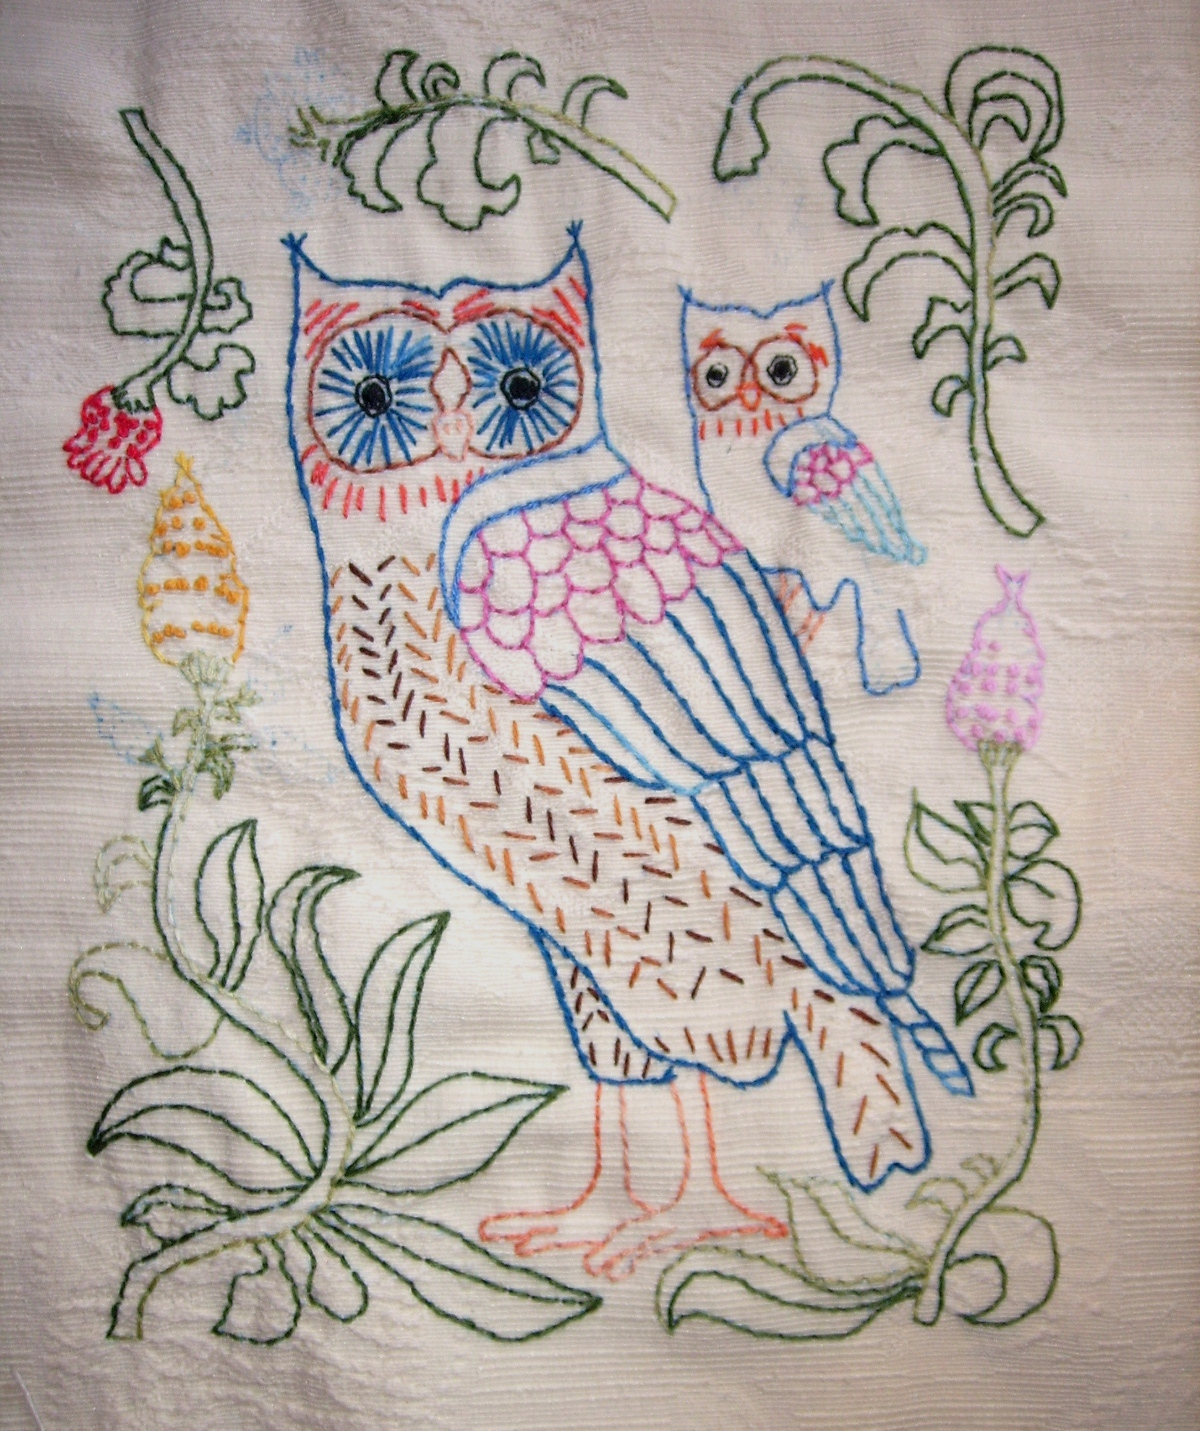 Hand embroidery mekhela sador makaroka